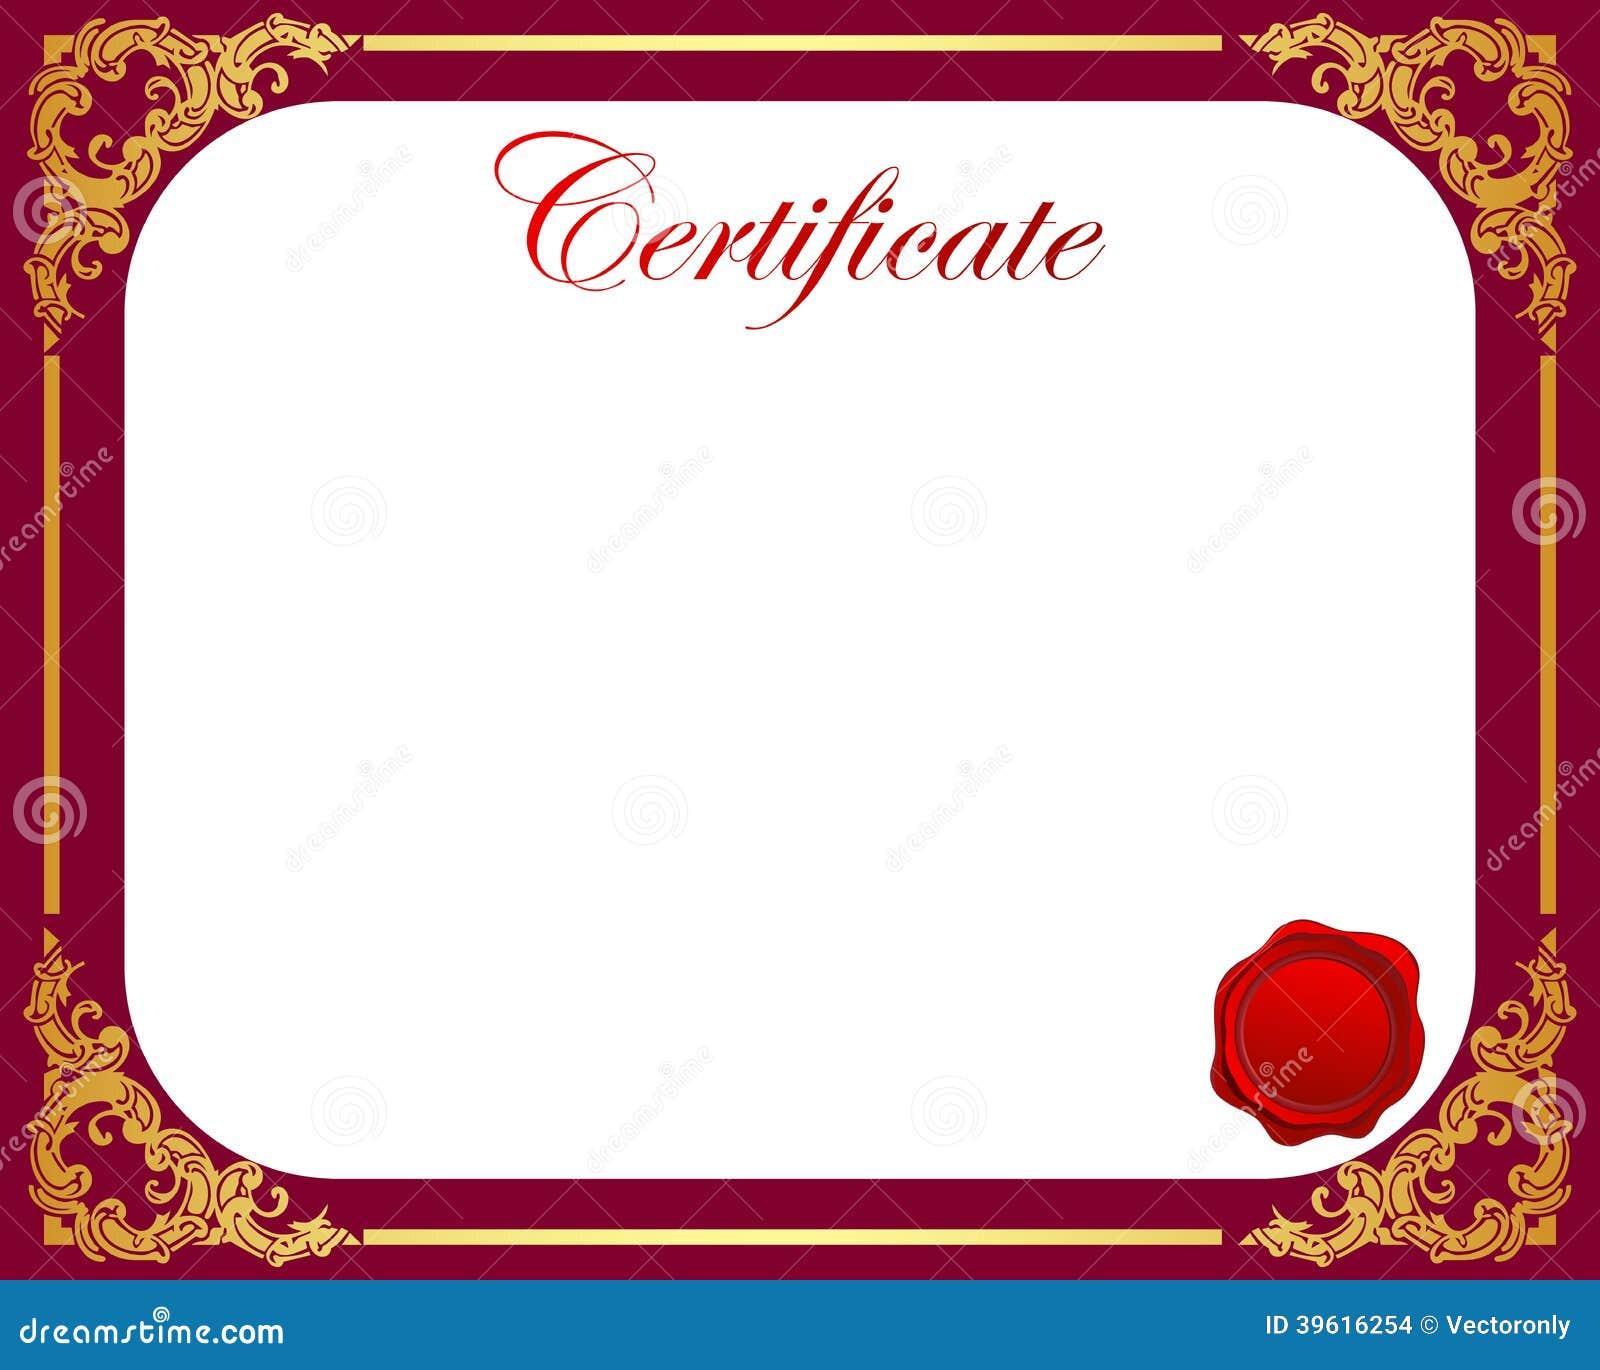 Certificate Stock Vector - Image: 39616254